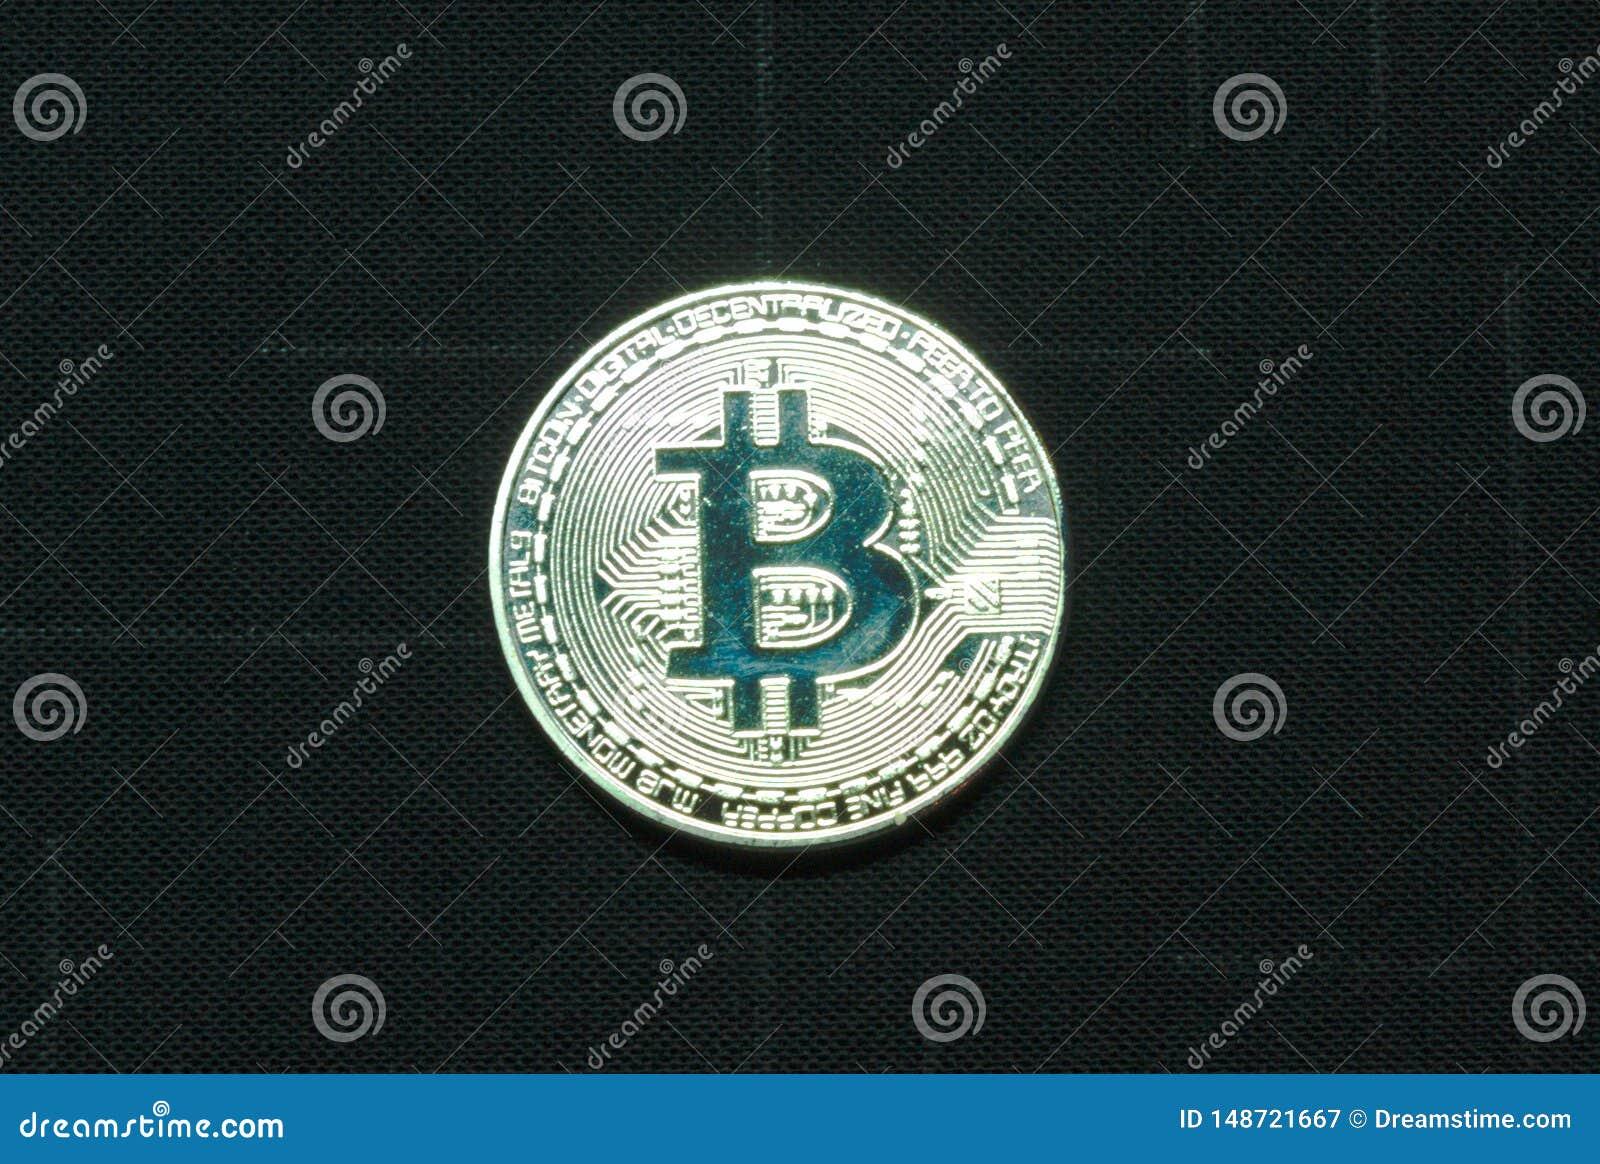 Монетка bitcoin Ilver на черной предпосылке